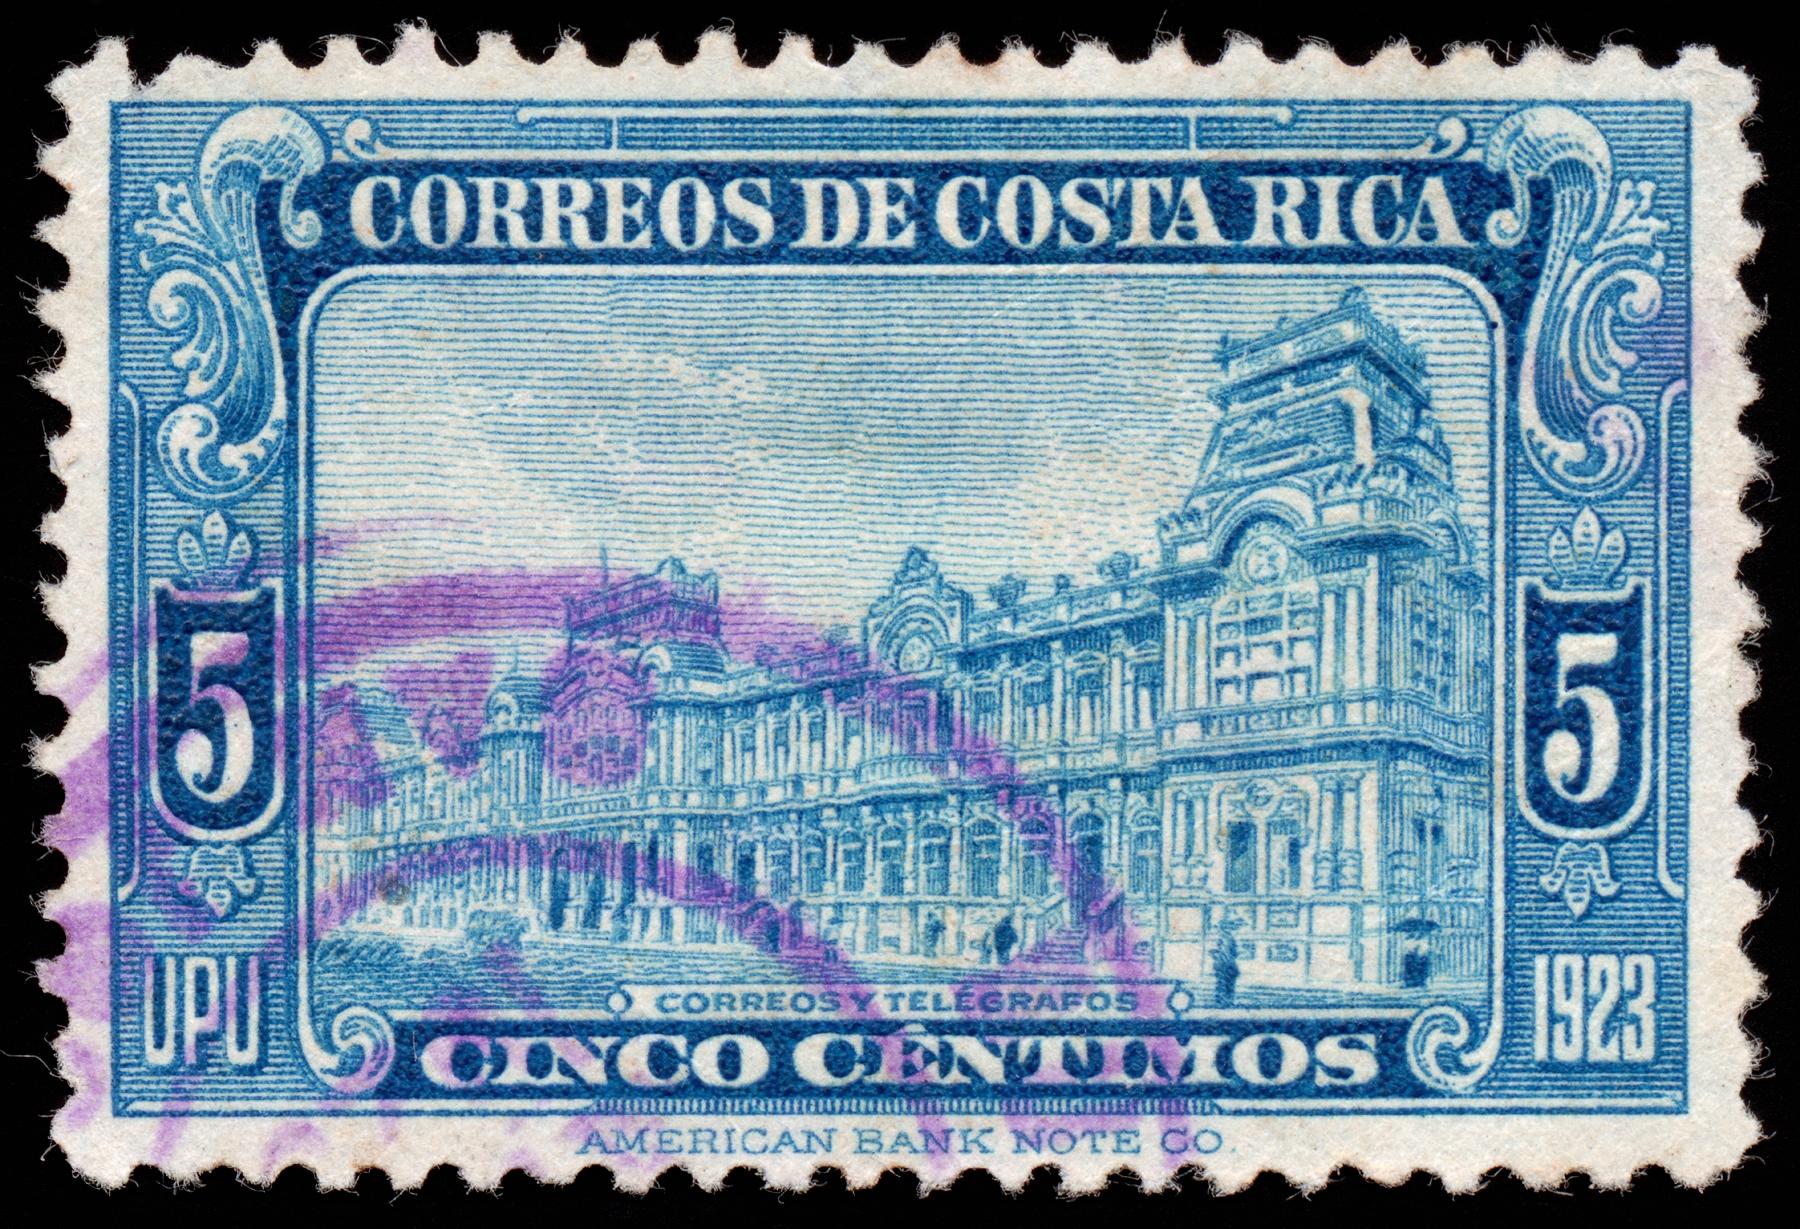 Blue Post Building Stamp, Rectangle, Postmark, Rectangular, Resource, HQ Photo